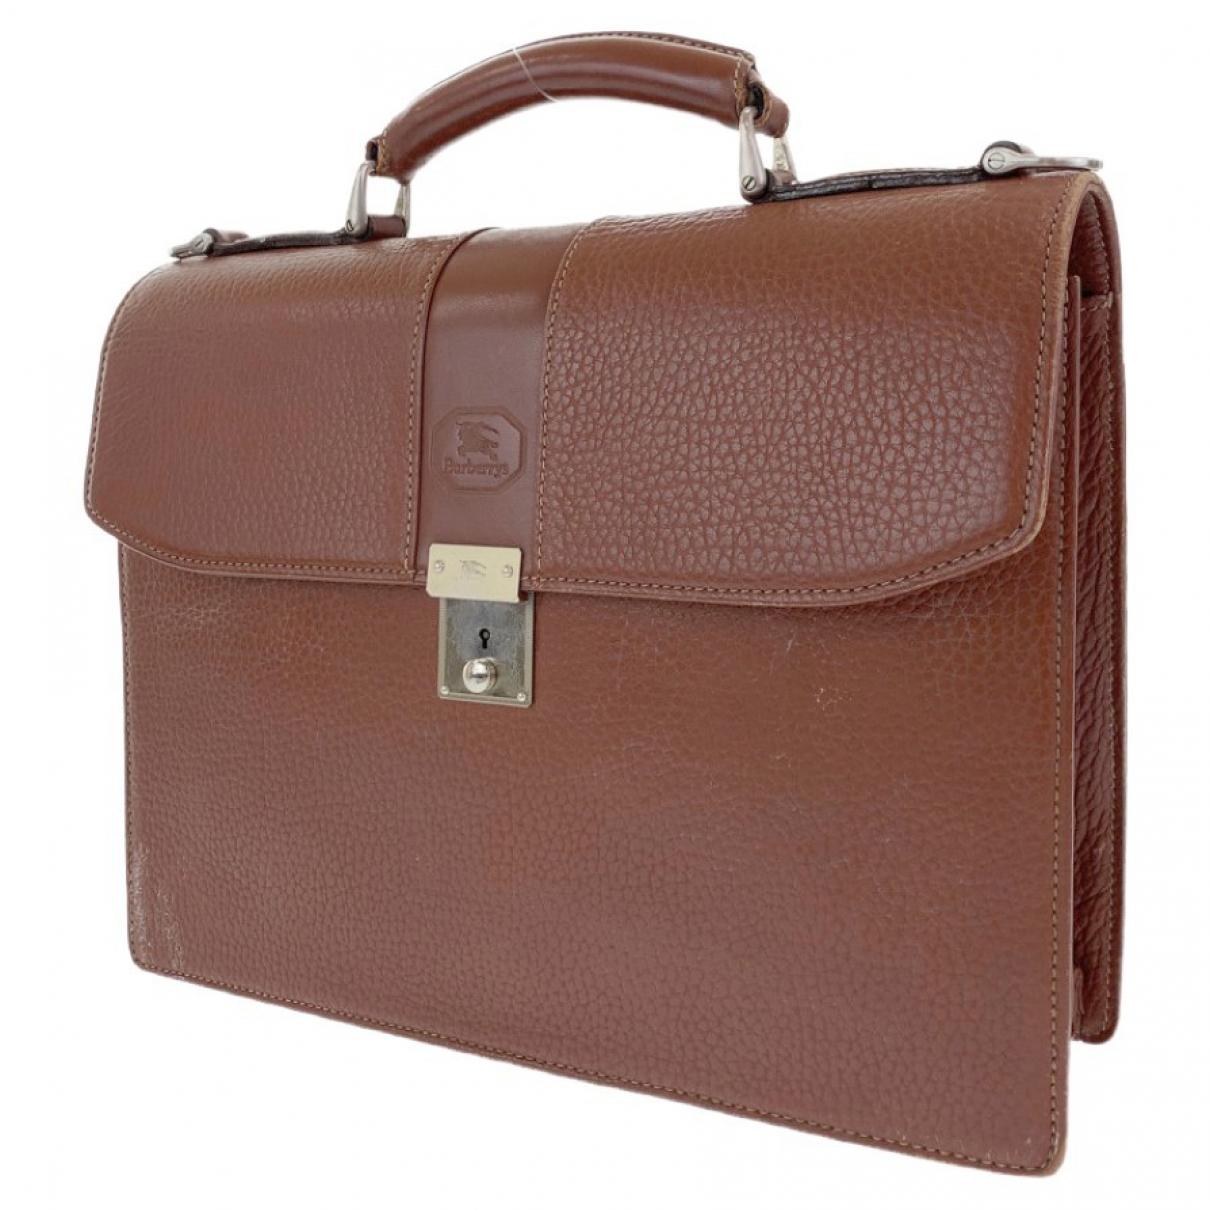 Burberry \N Leather bag for Men \N